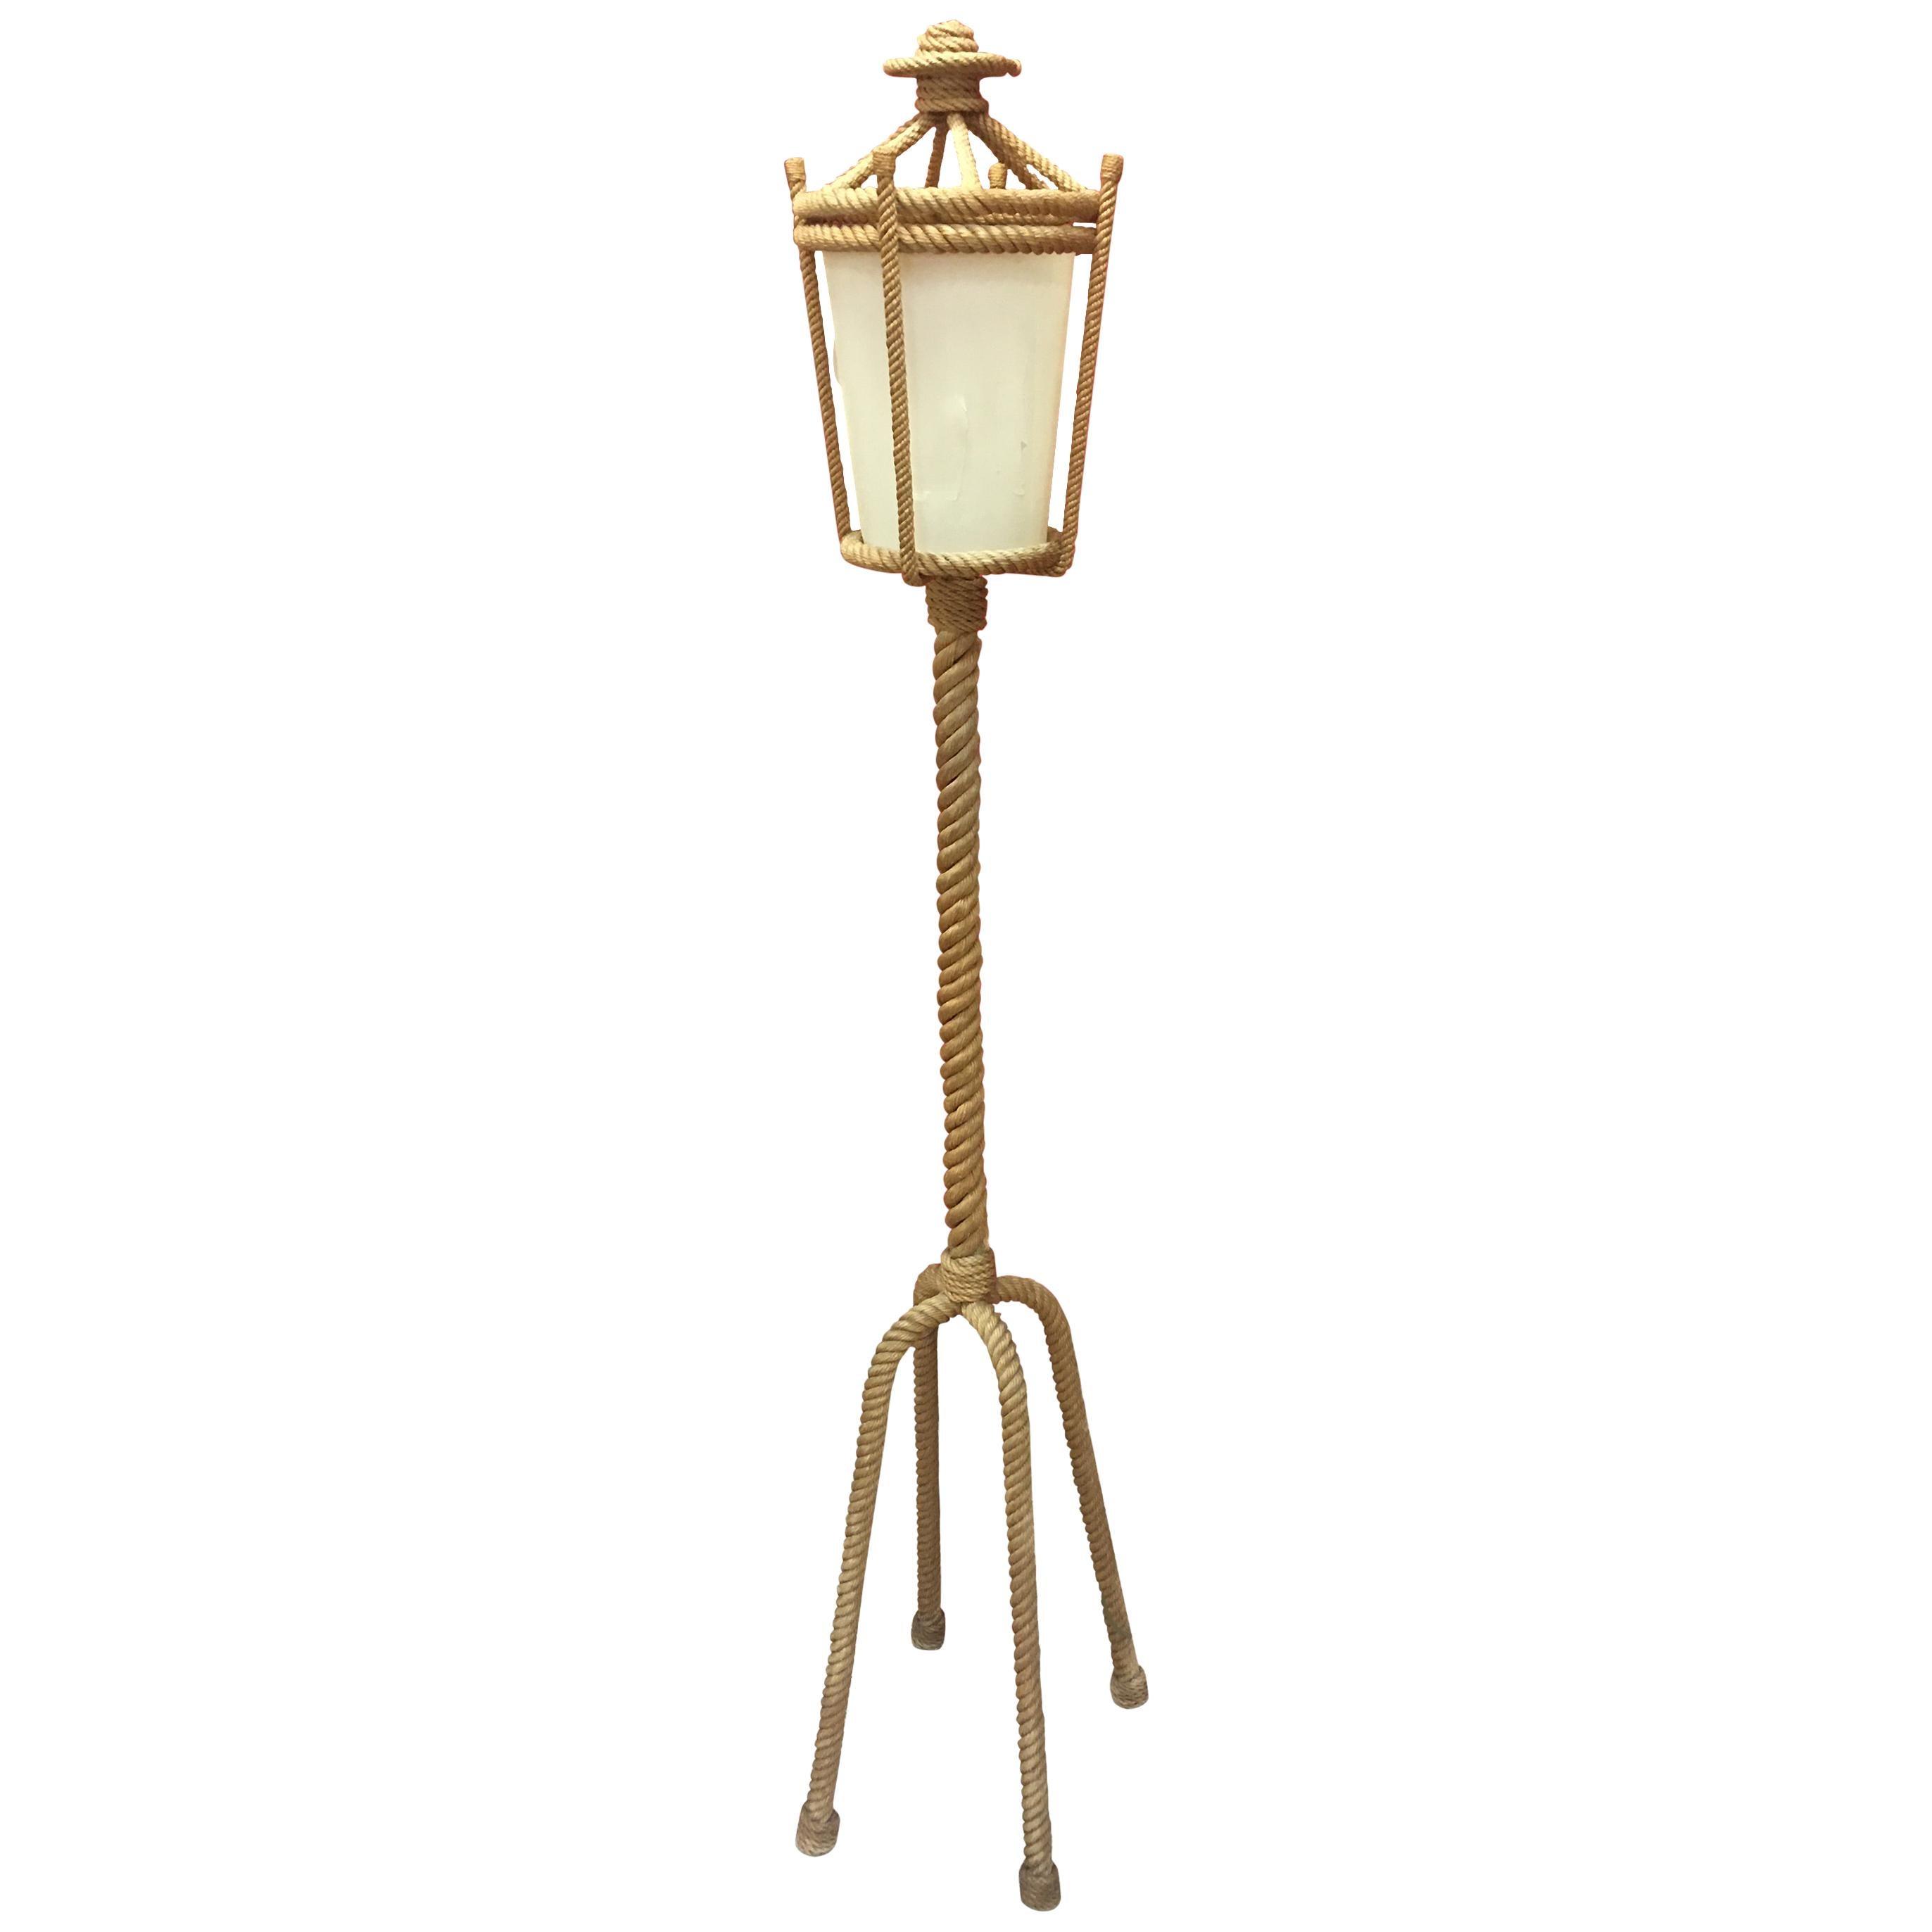 Audoux Minet Four-Legged Rope Floor Lamp, France, 1960s